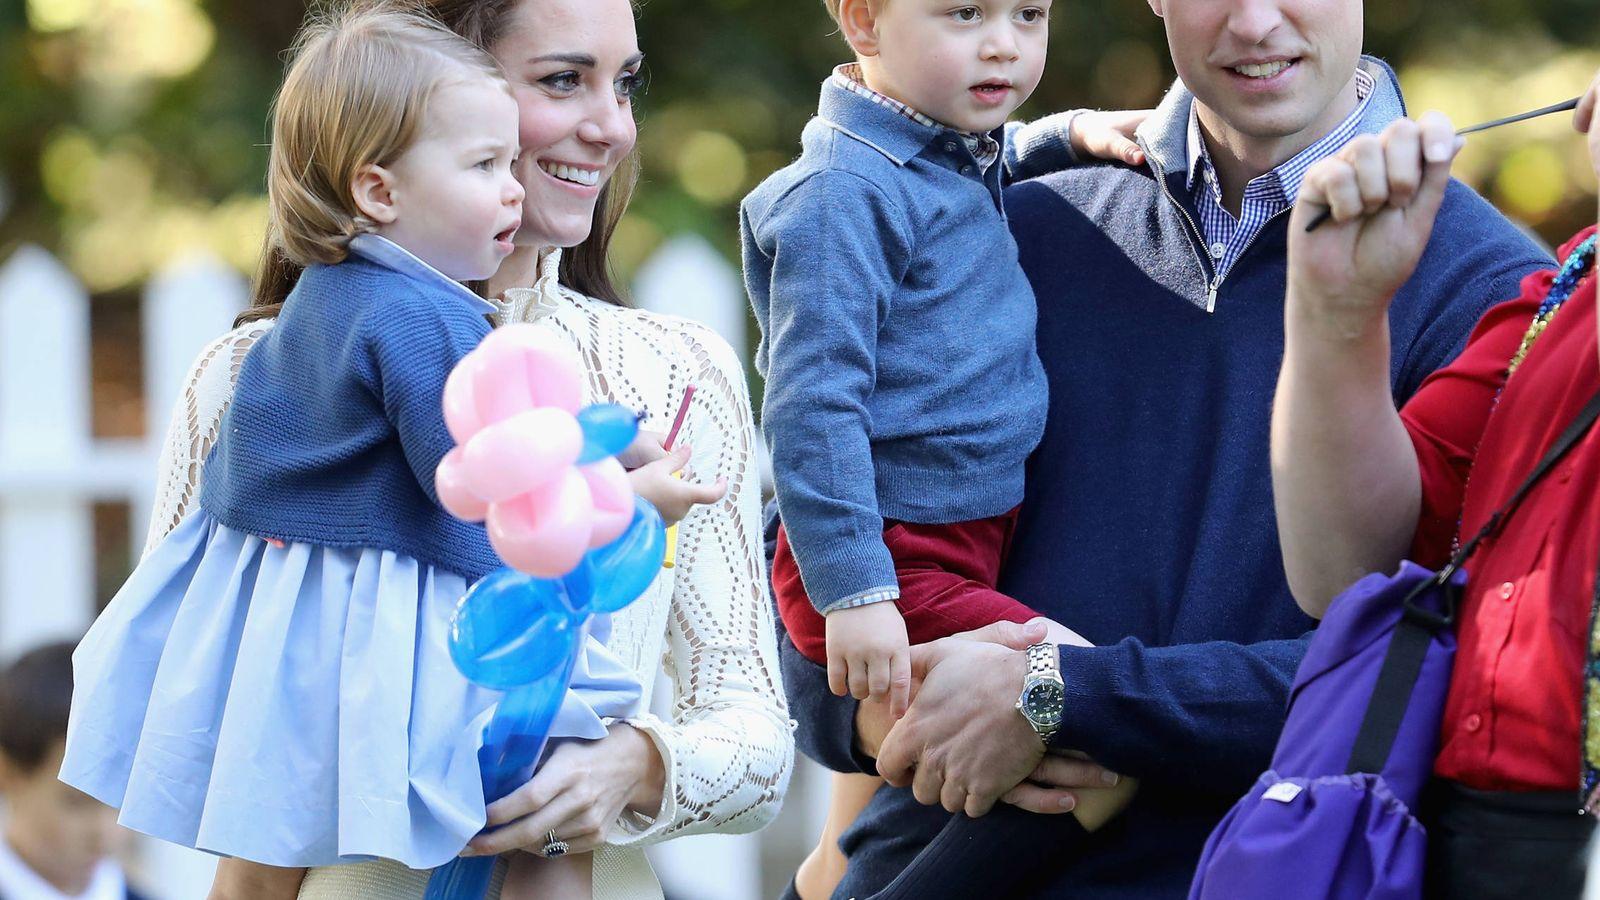 fcd1e26c73 Familia Real Británica  Los duques de Cambridge preparan su mudanza a  Londres